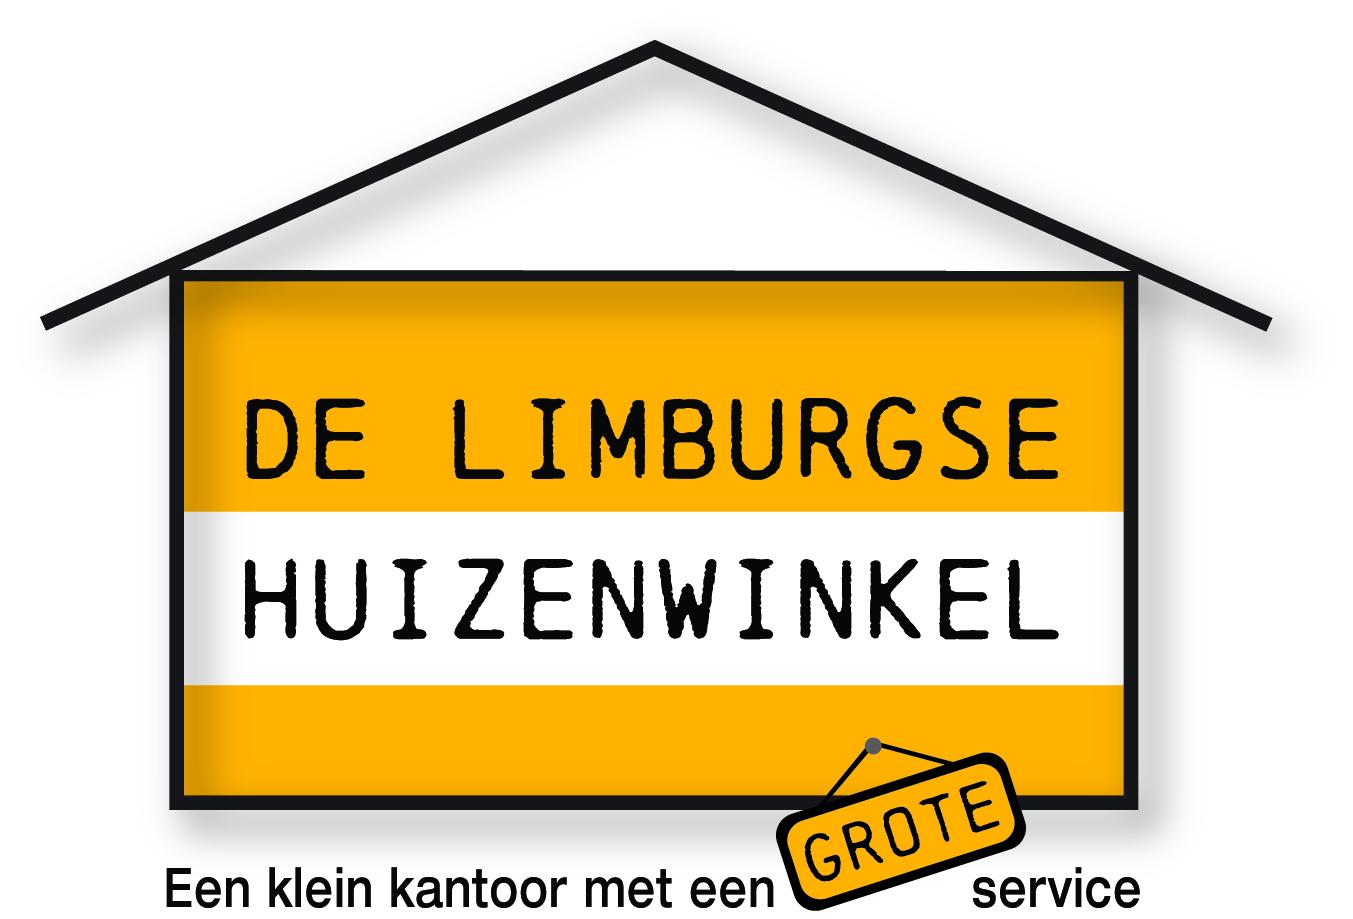 Logo De Limburgse Huizenwinkel